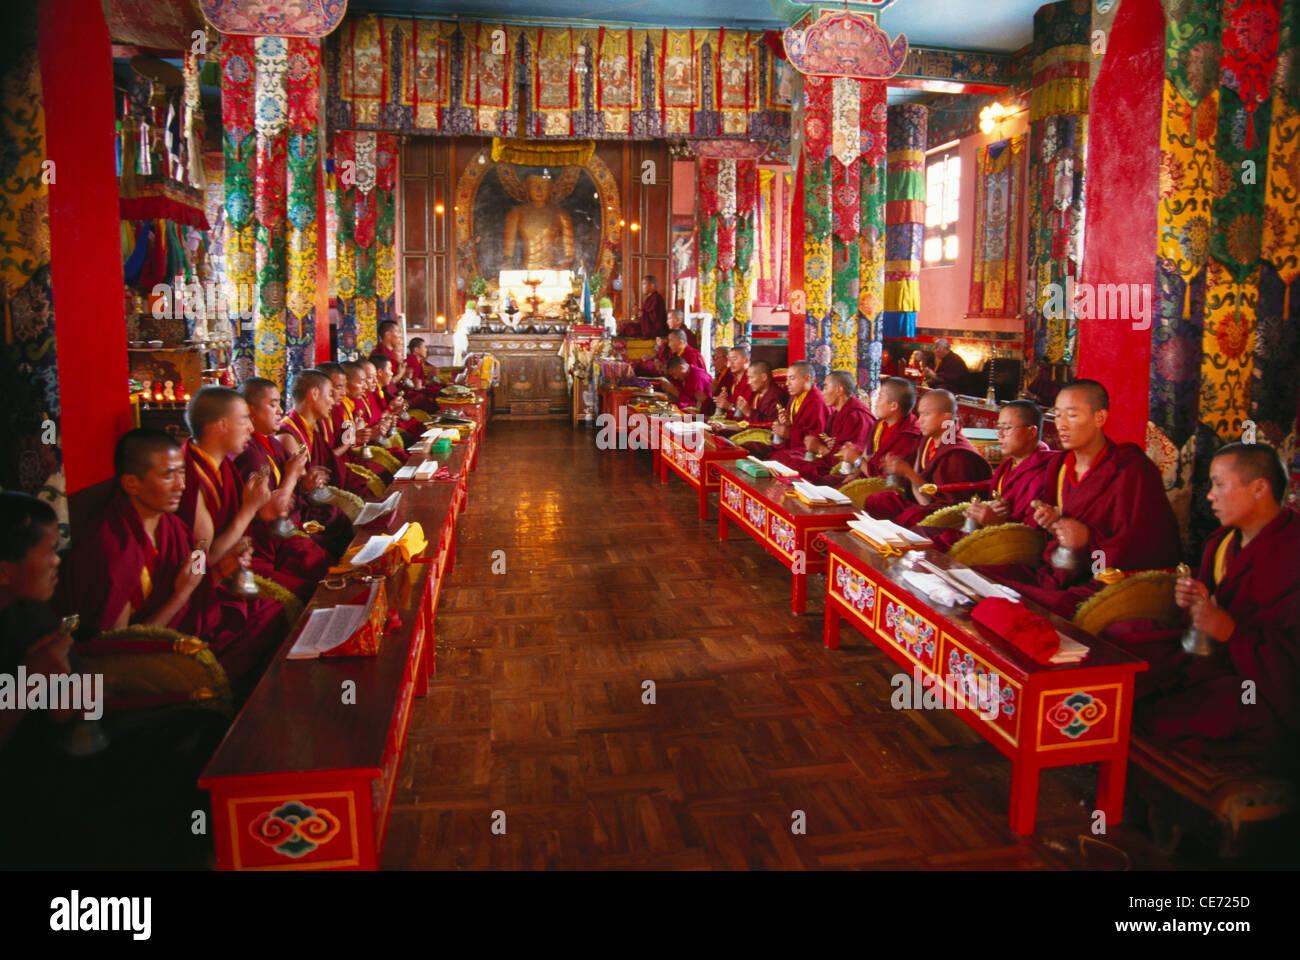 RSC 81737 : Tibetan Buddhist monks praying in monastery ...